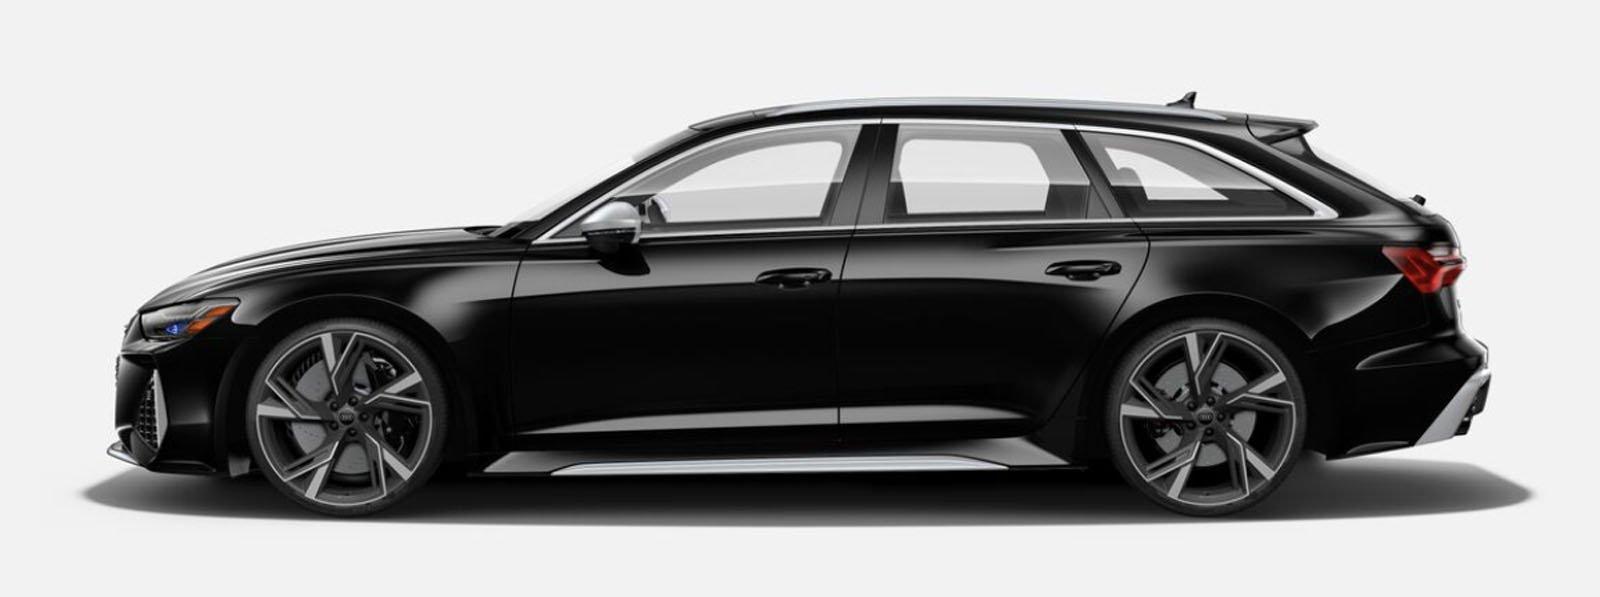 2021 Audi RS 6 Avant Myth Black